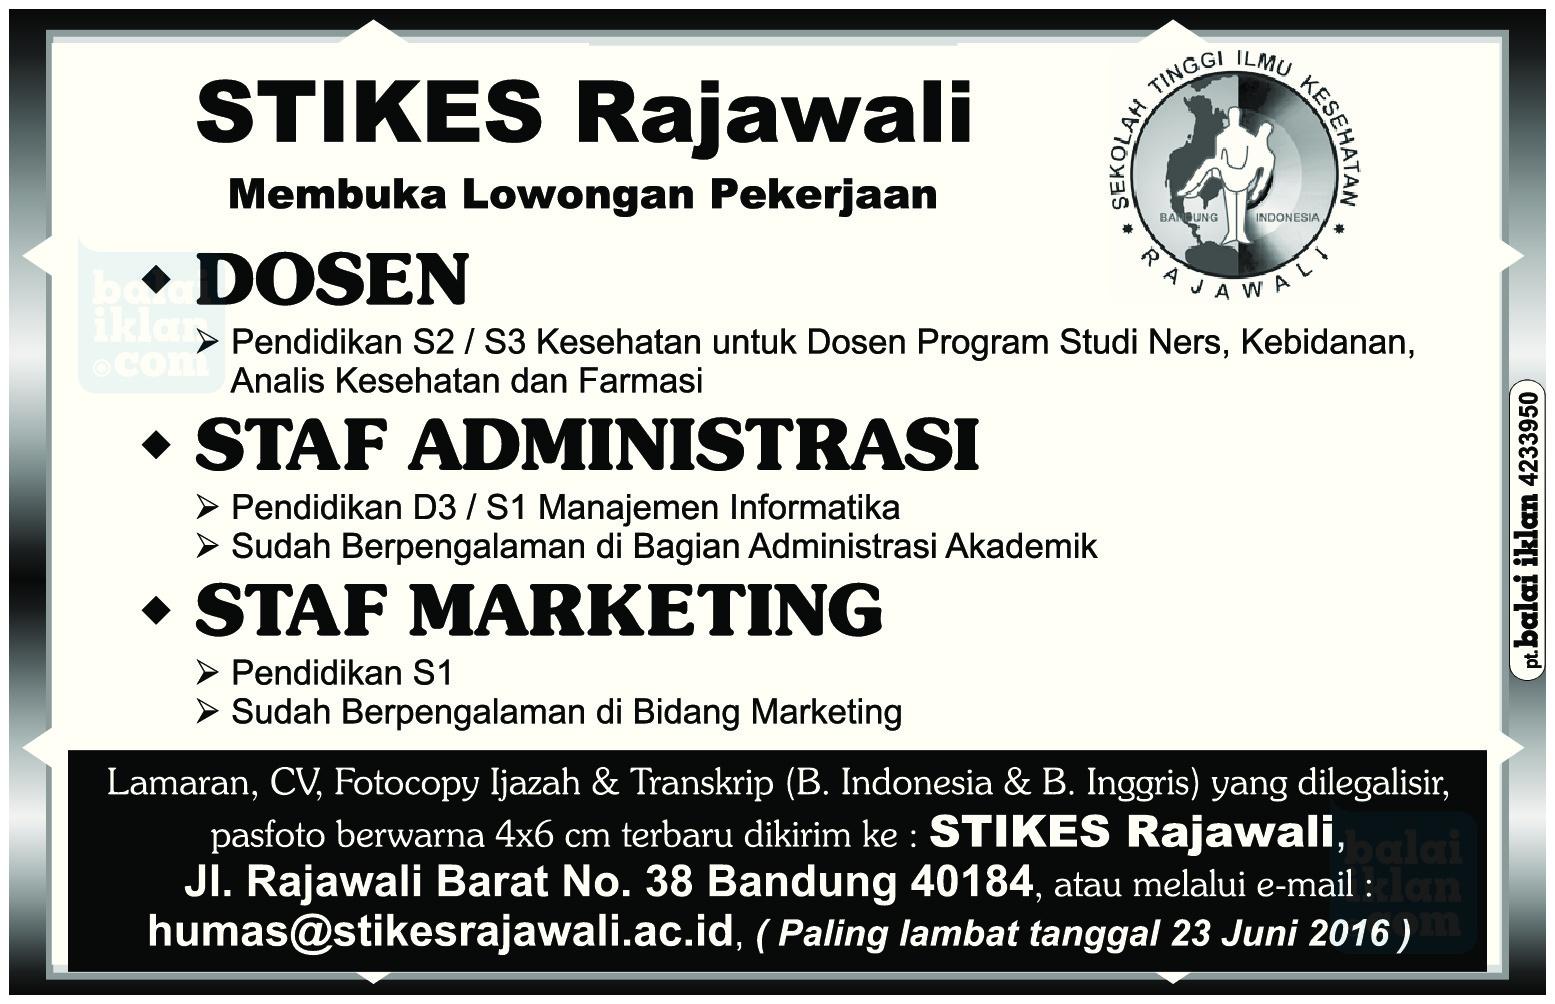 Lowongan Kerja STIKES Rajawali Juni 2016